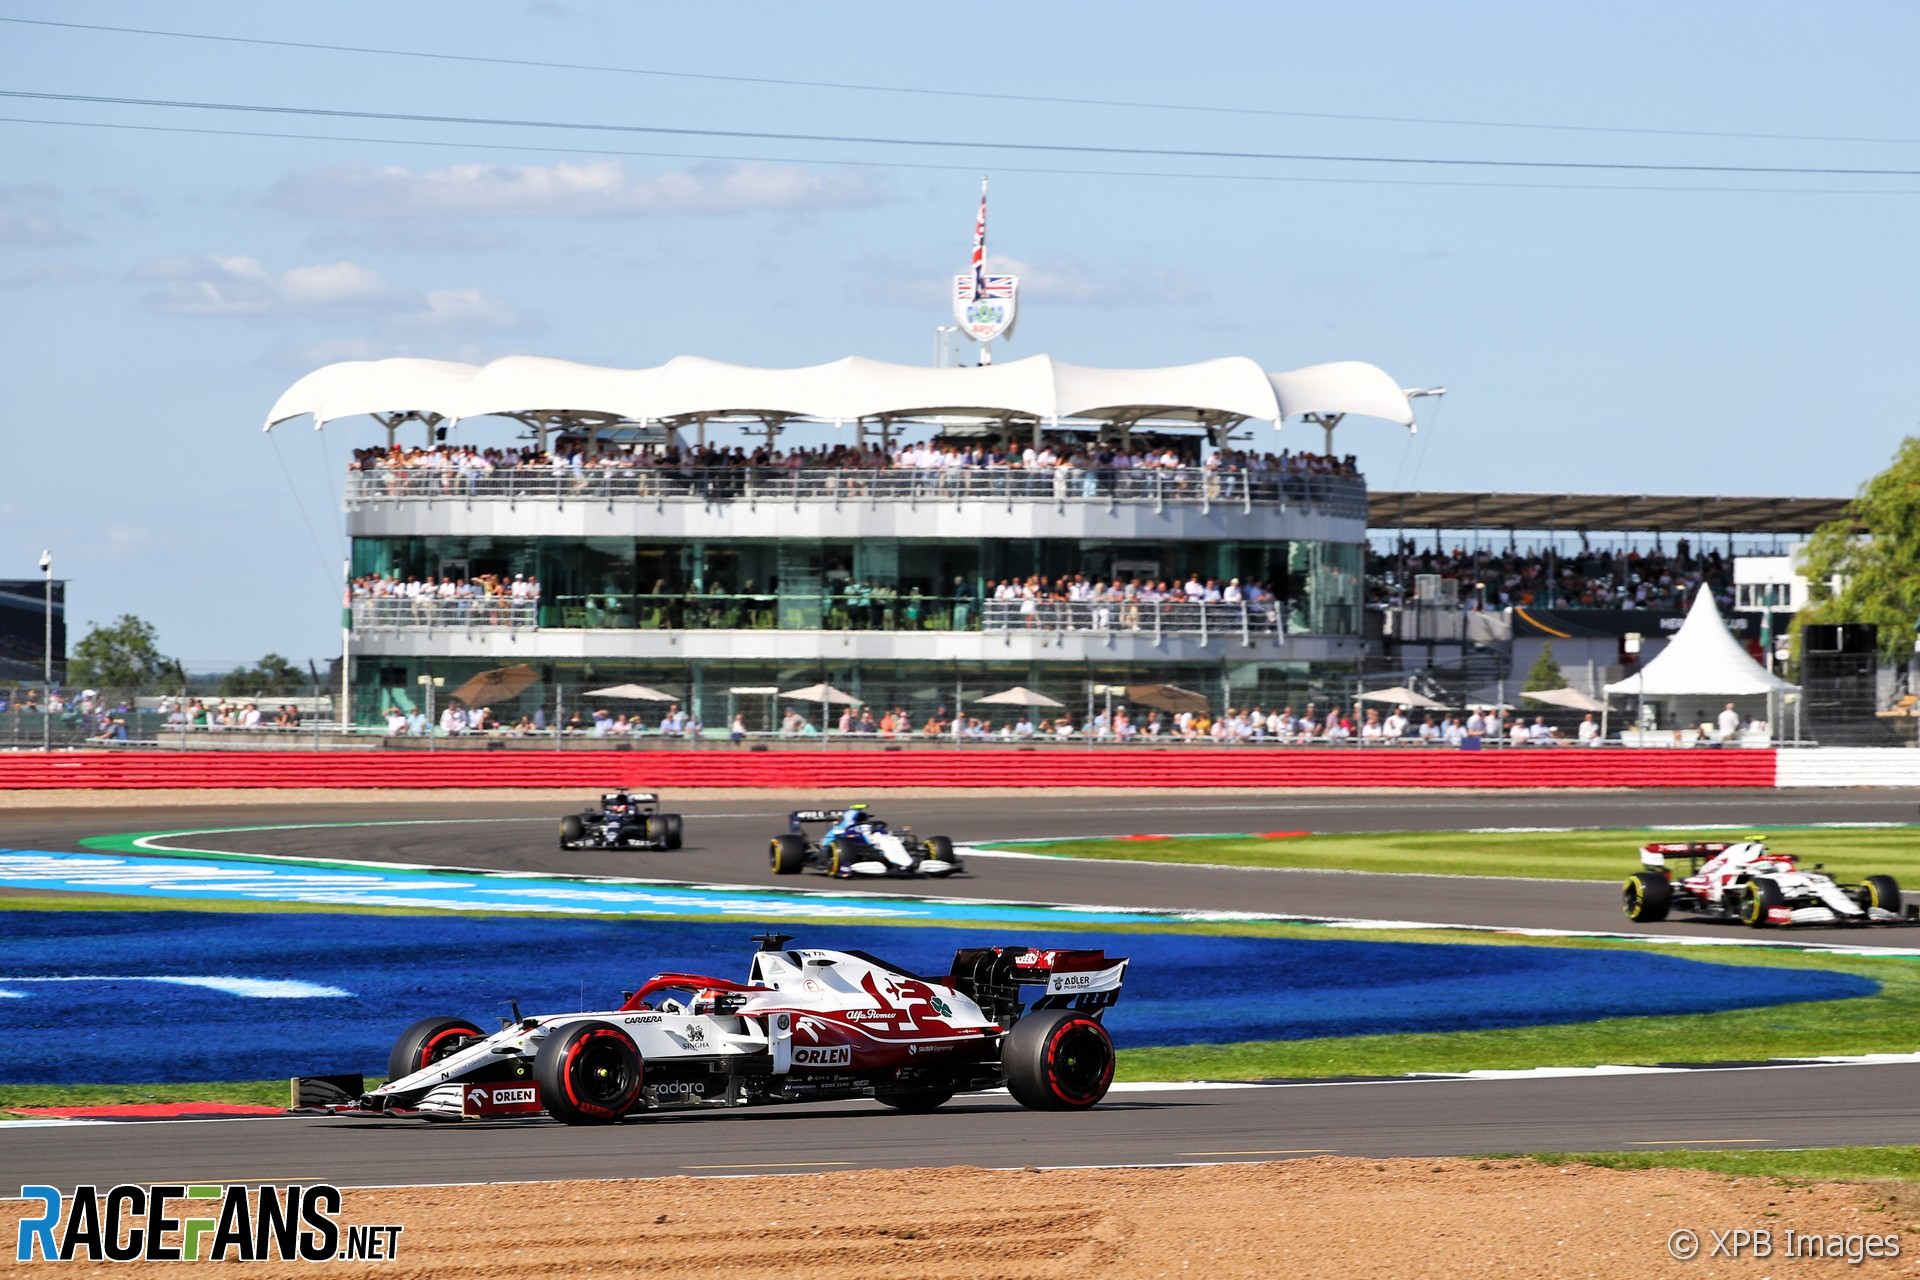 Kimi Raikkonen, Alfa Romeo, Silverstone, 2021